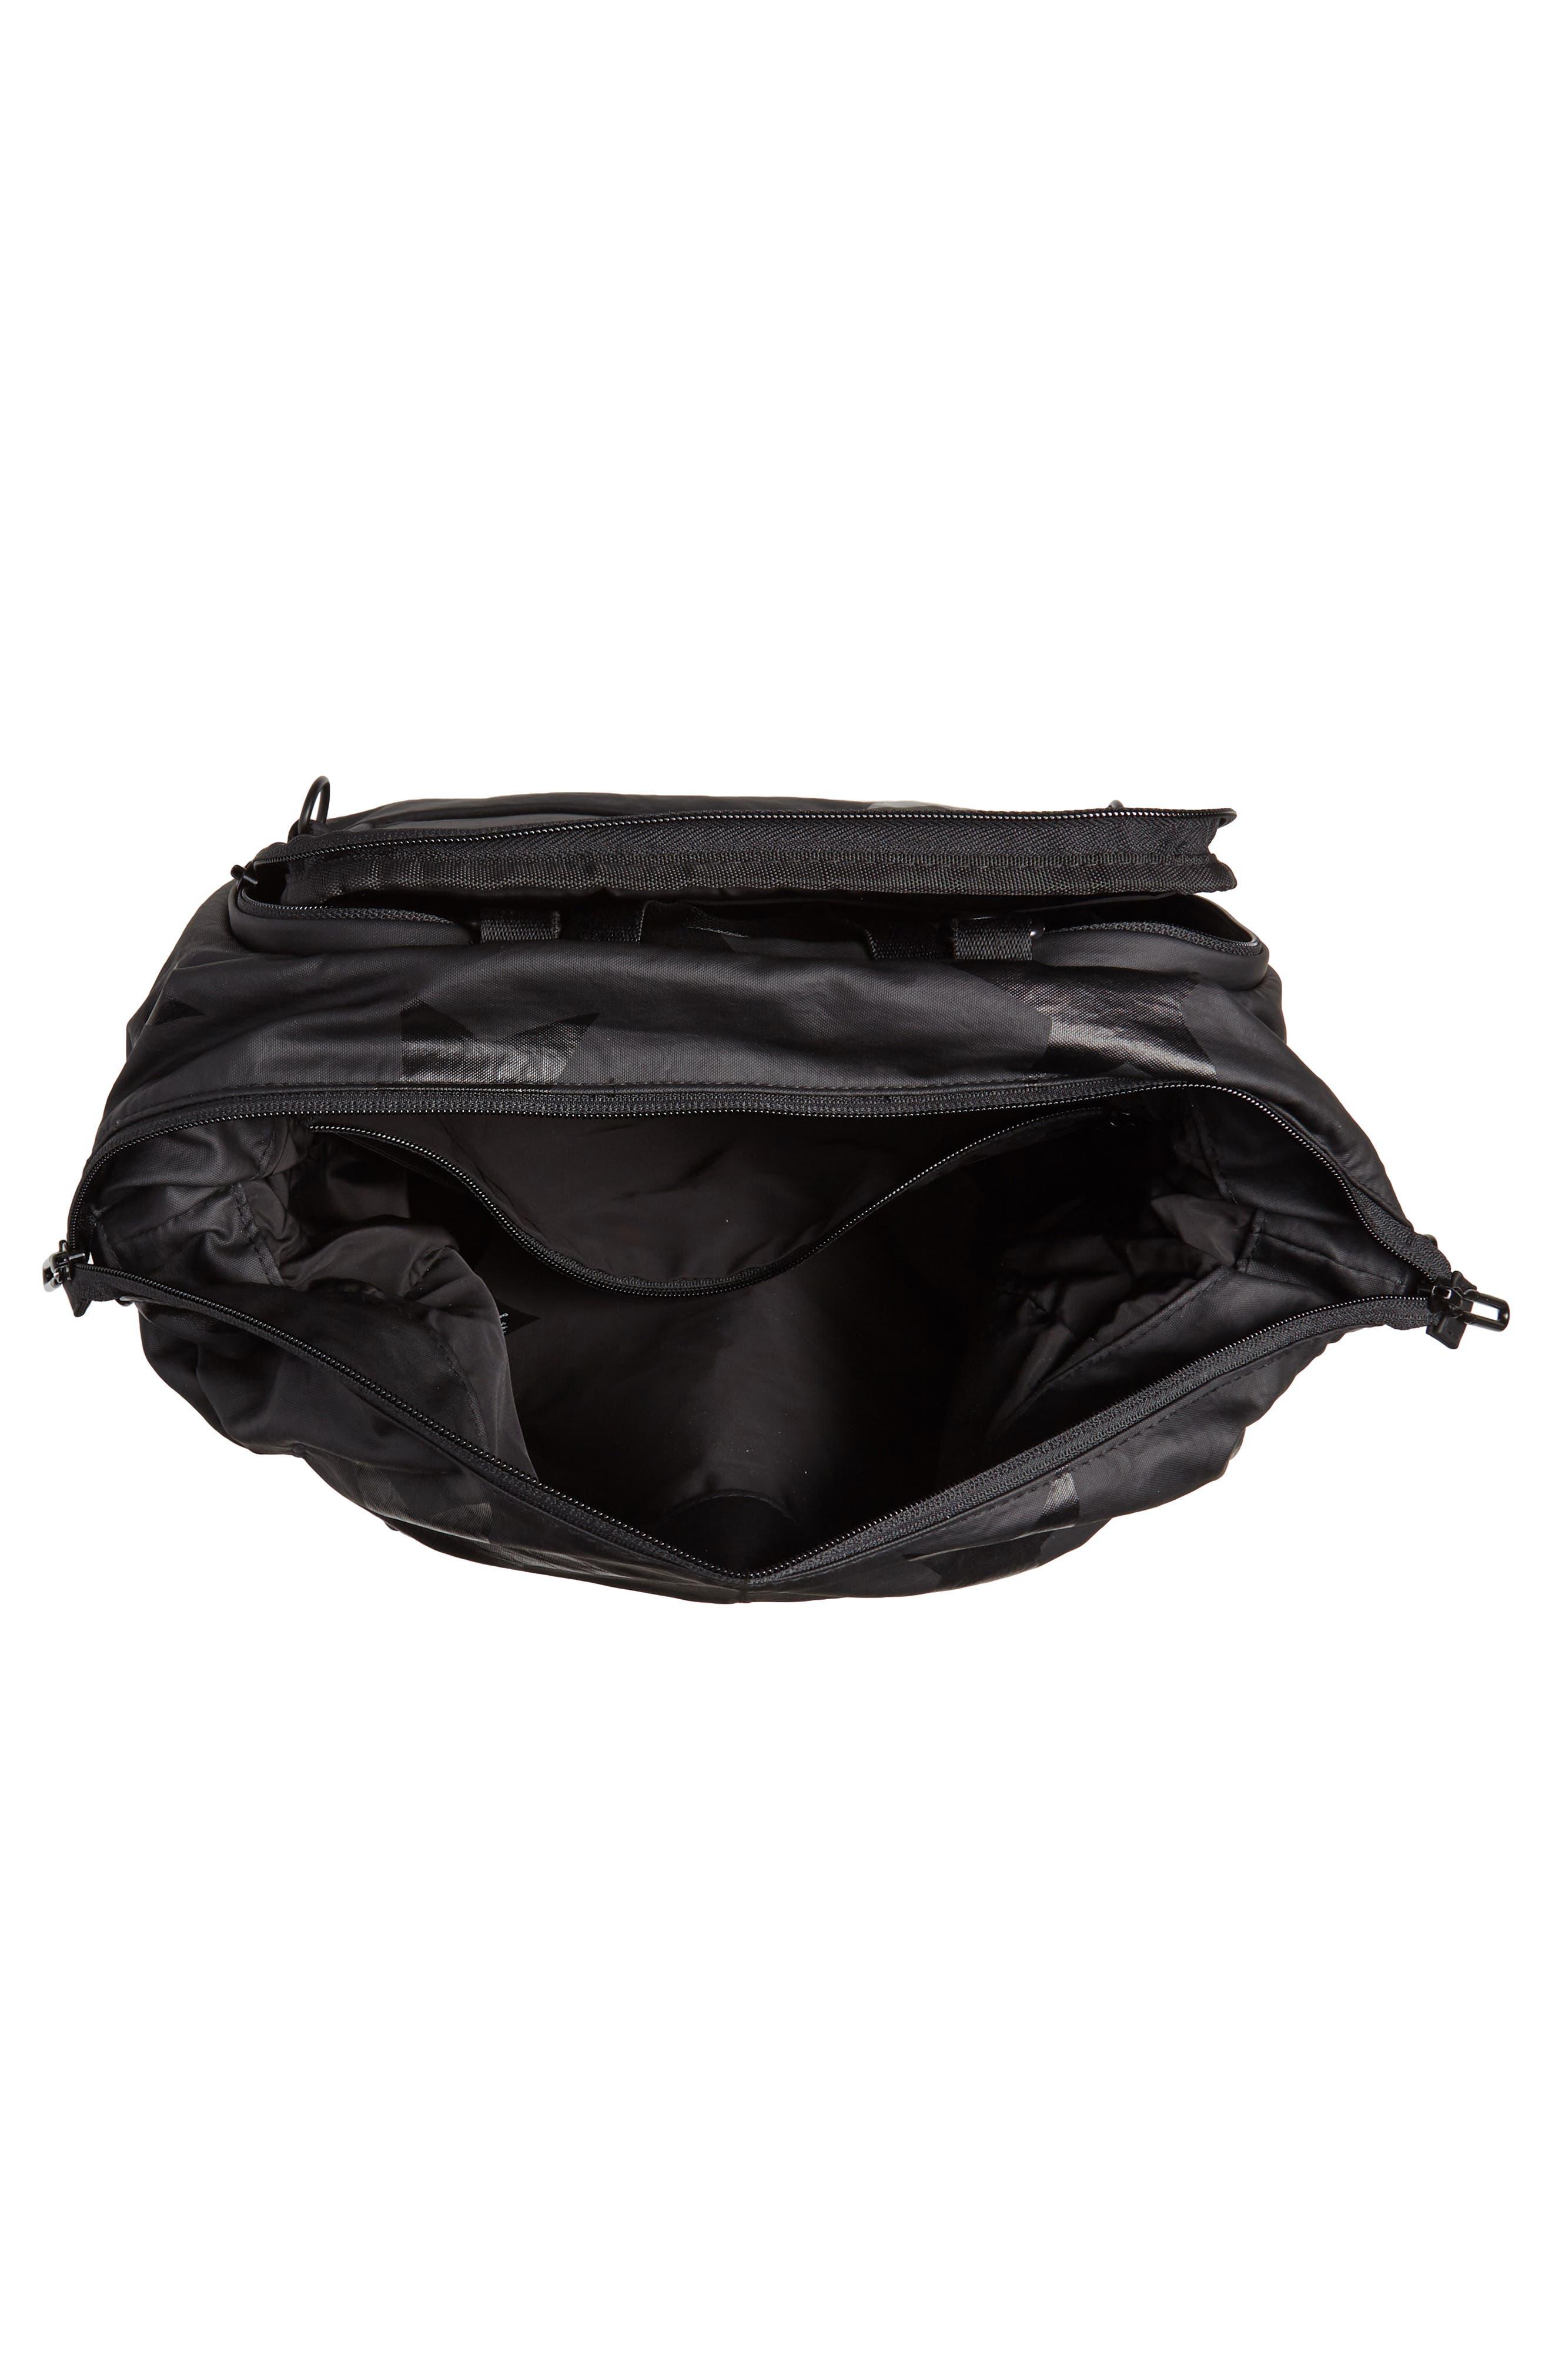 +one duo Nylon Convertible Diaper Bag,                             Alternate thumbnail 4, color,                             BLACK STAR